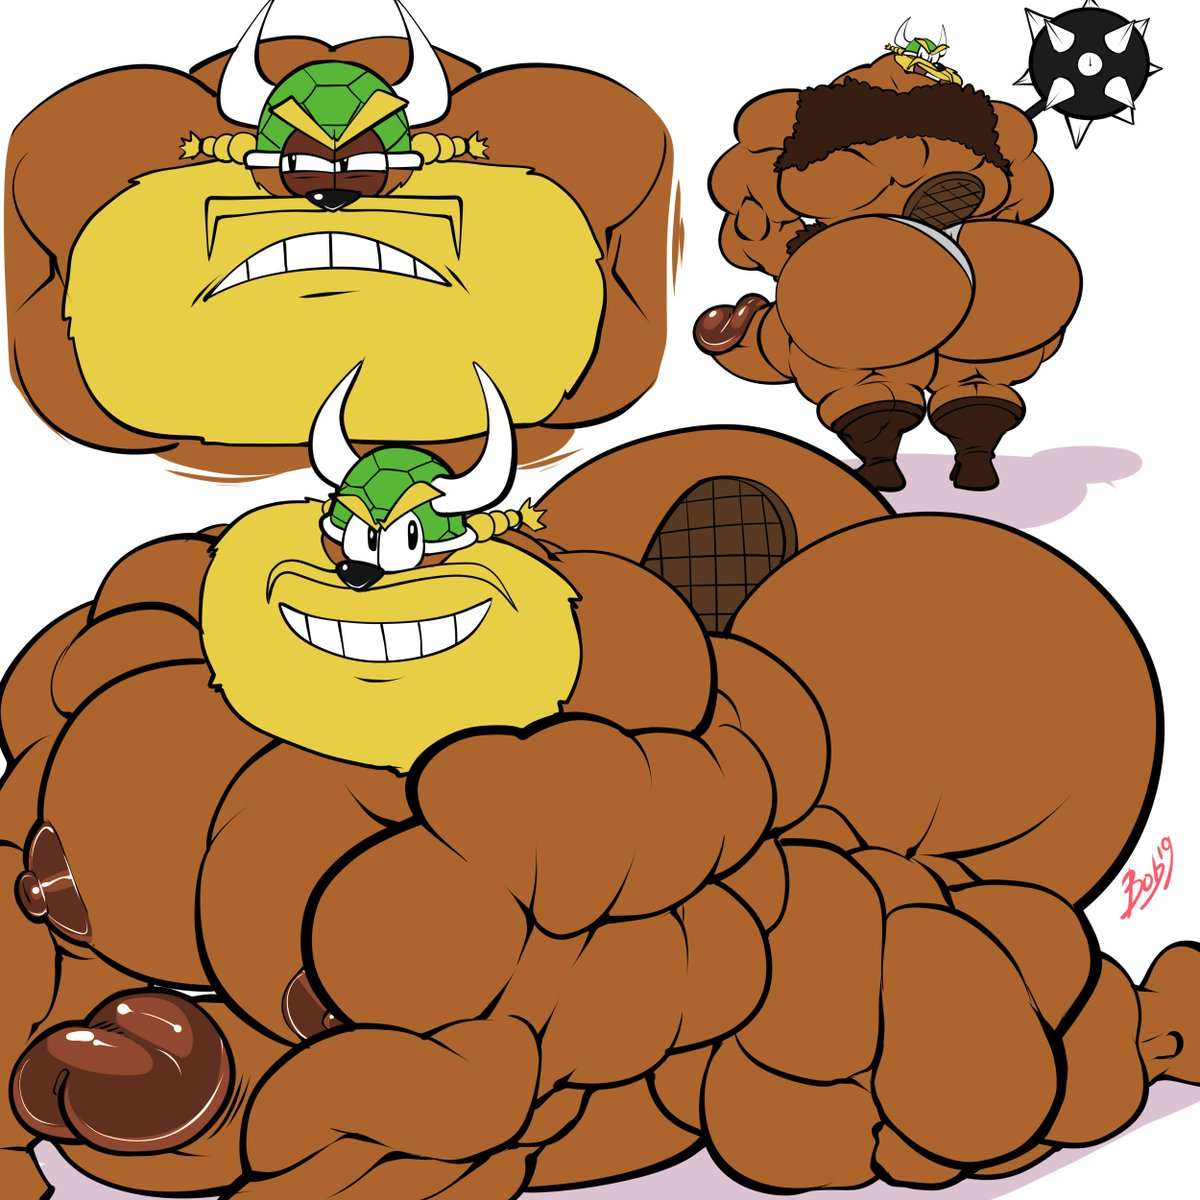 cartoon porn big gay dick Sonic transformed 3 ctrl-z